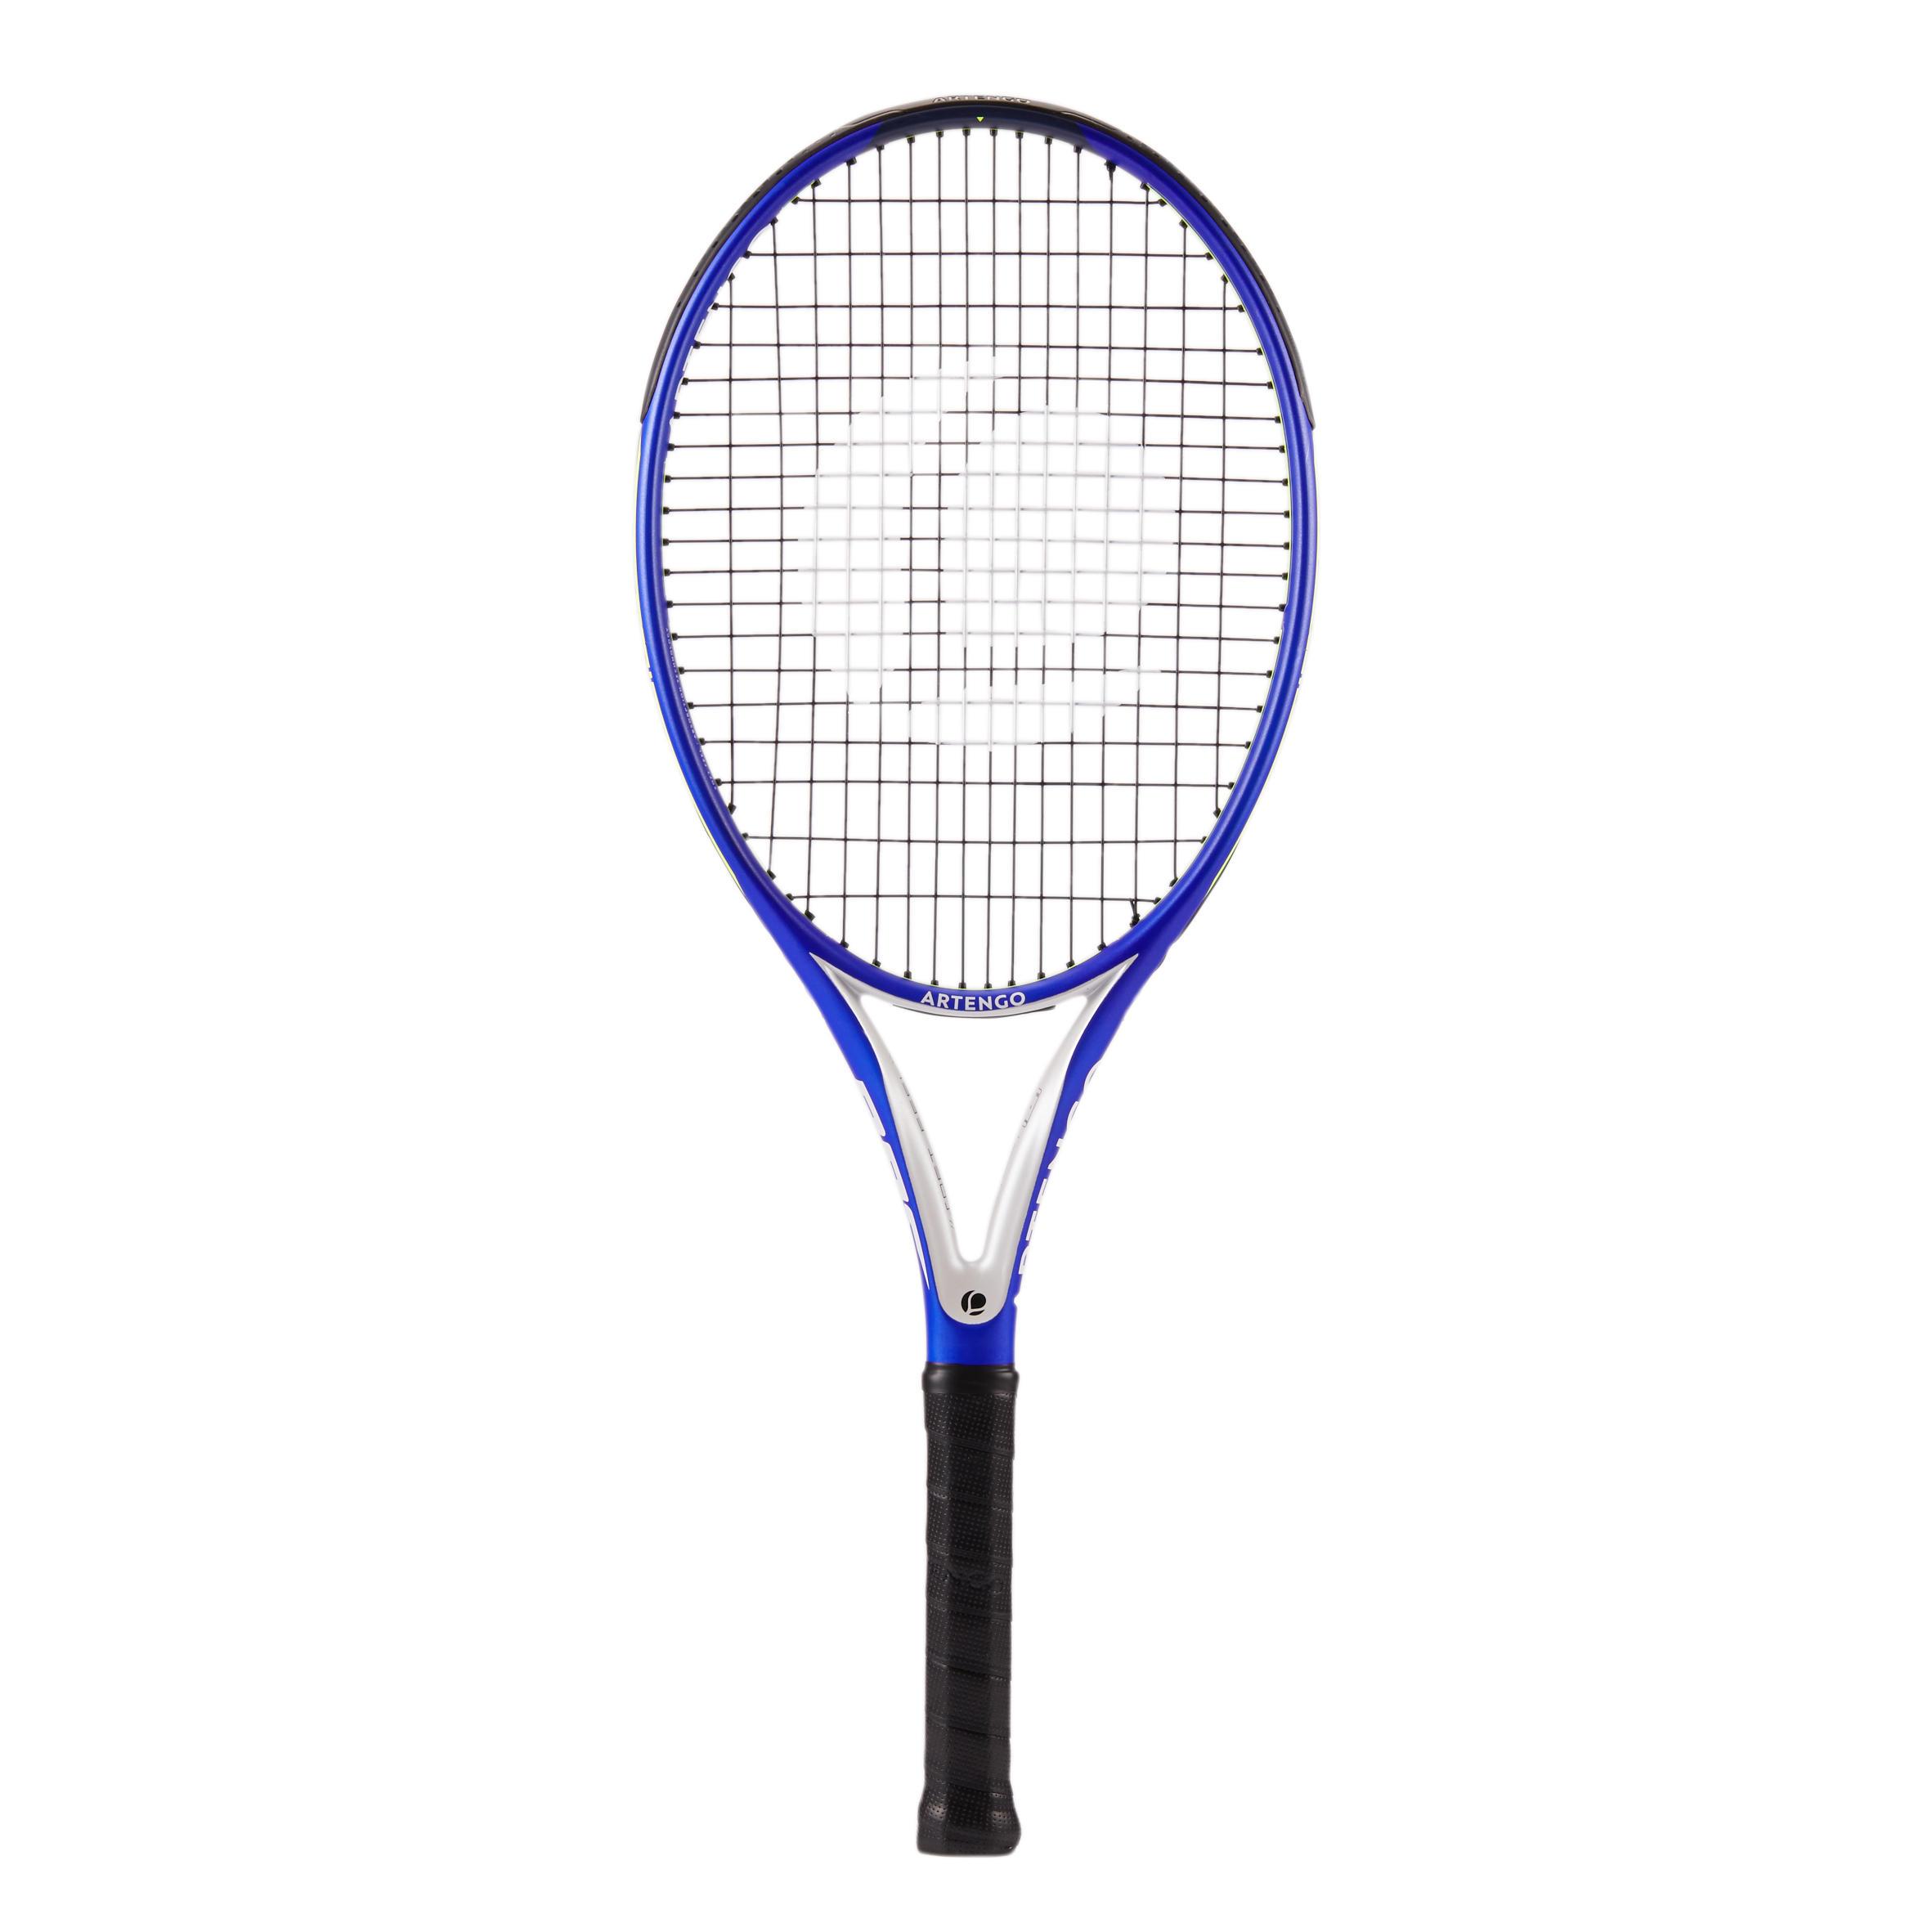 Tennis Racket Buy Tennis Rackets Online At Low Prices